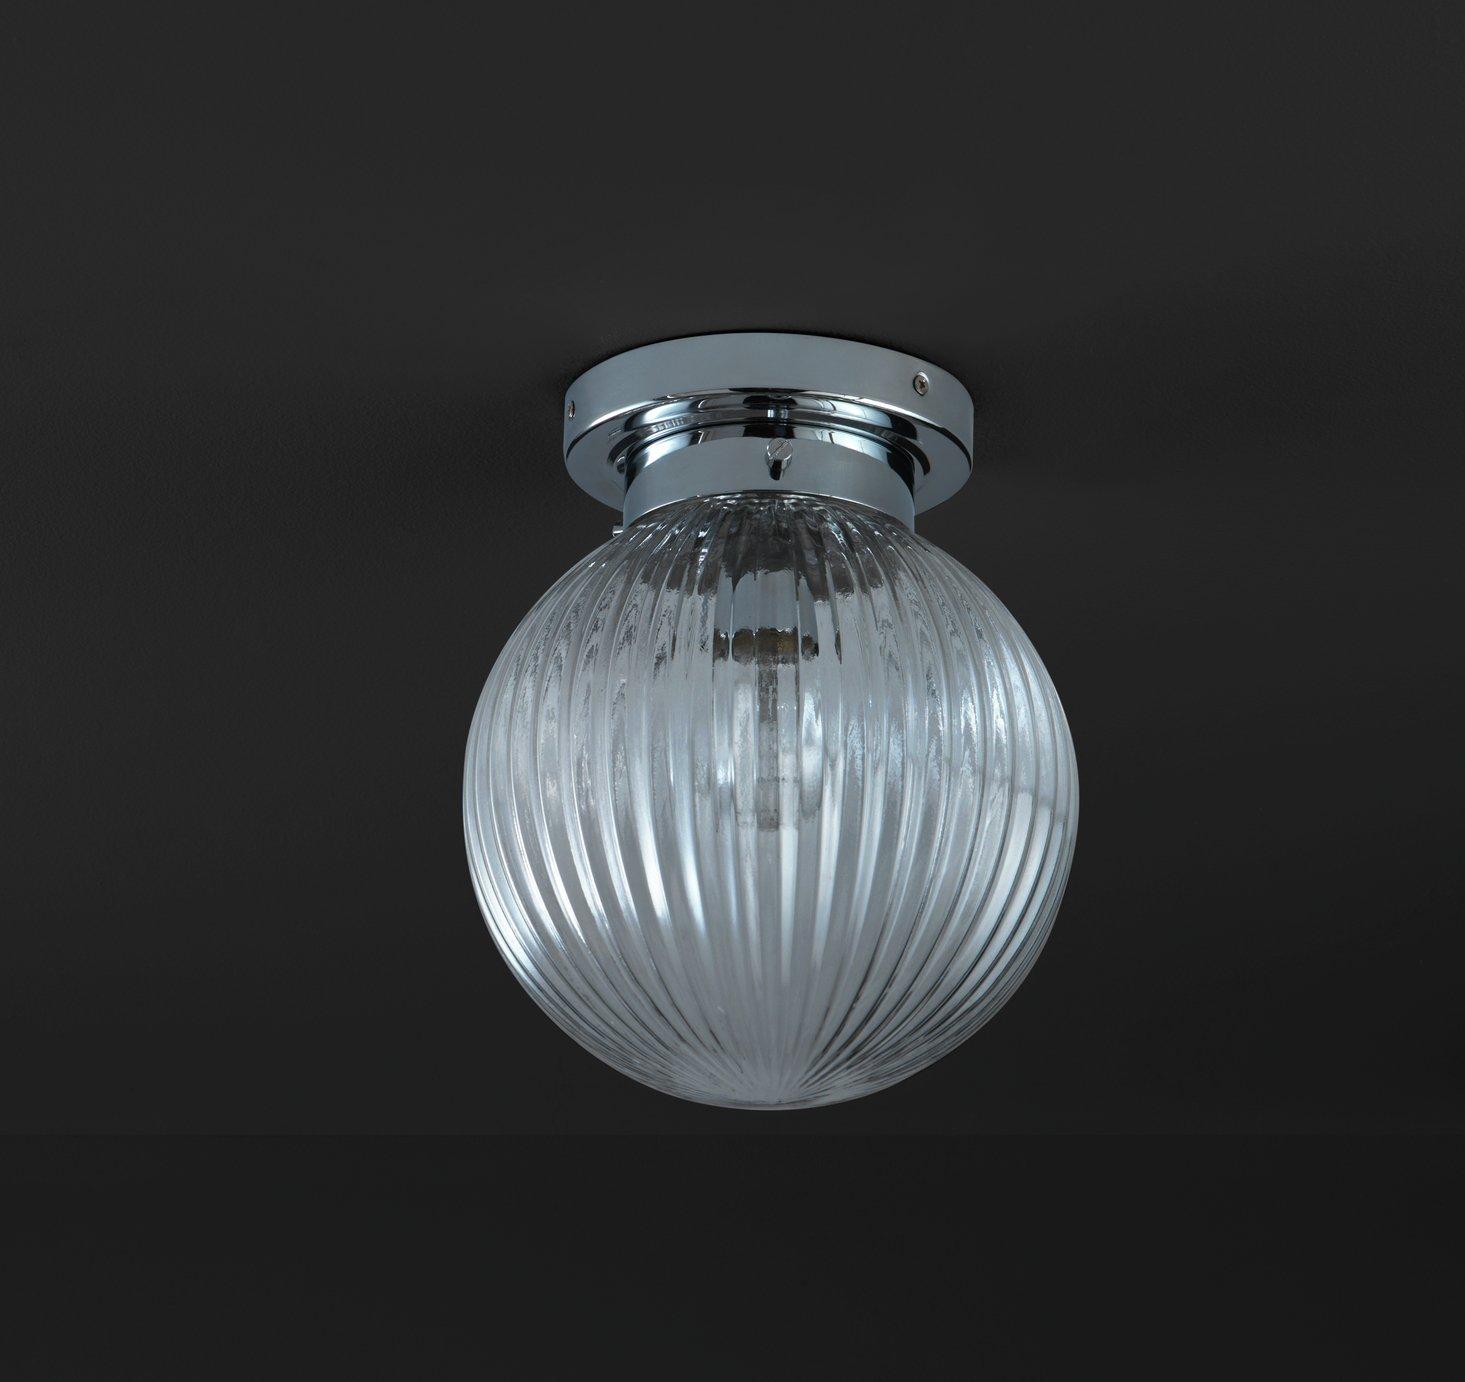 Argos Home Kerridge Ribbed Glass Bathroom Ceiling Light